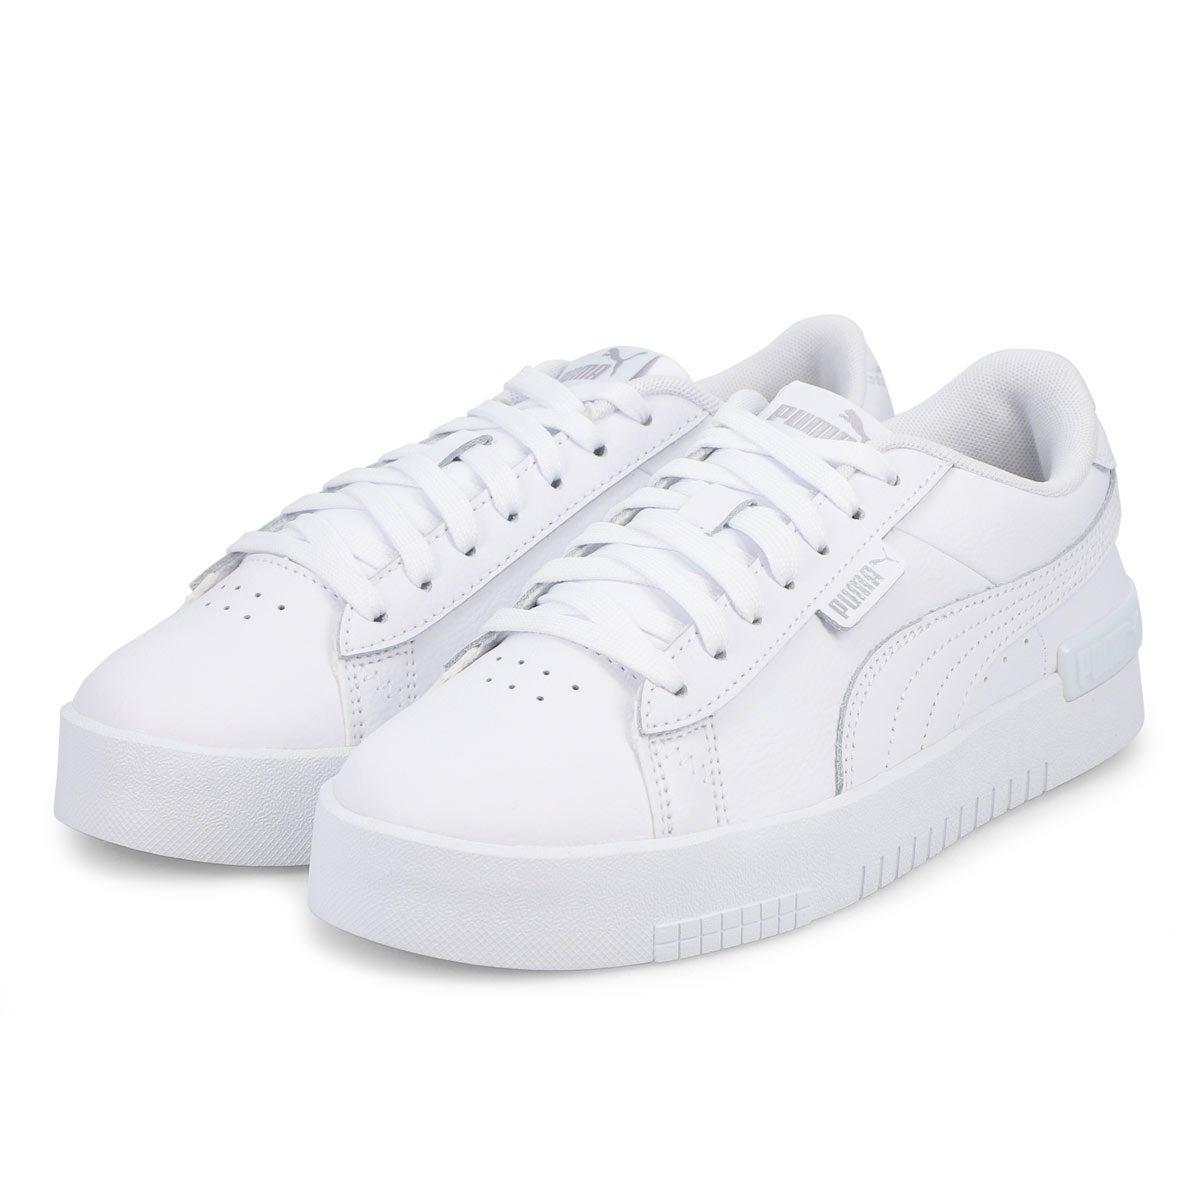 Women's Jada Sneaker - White